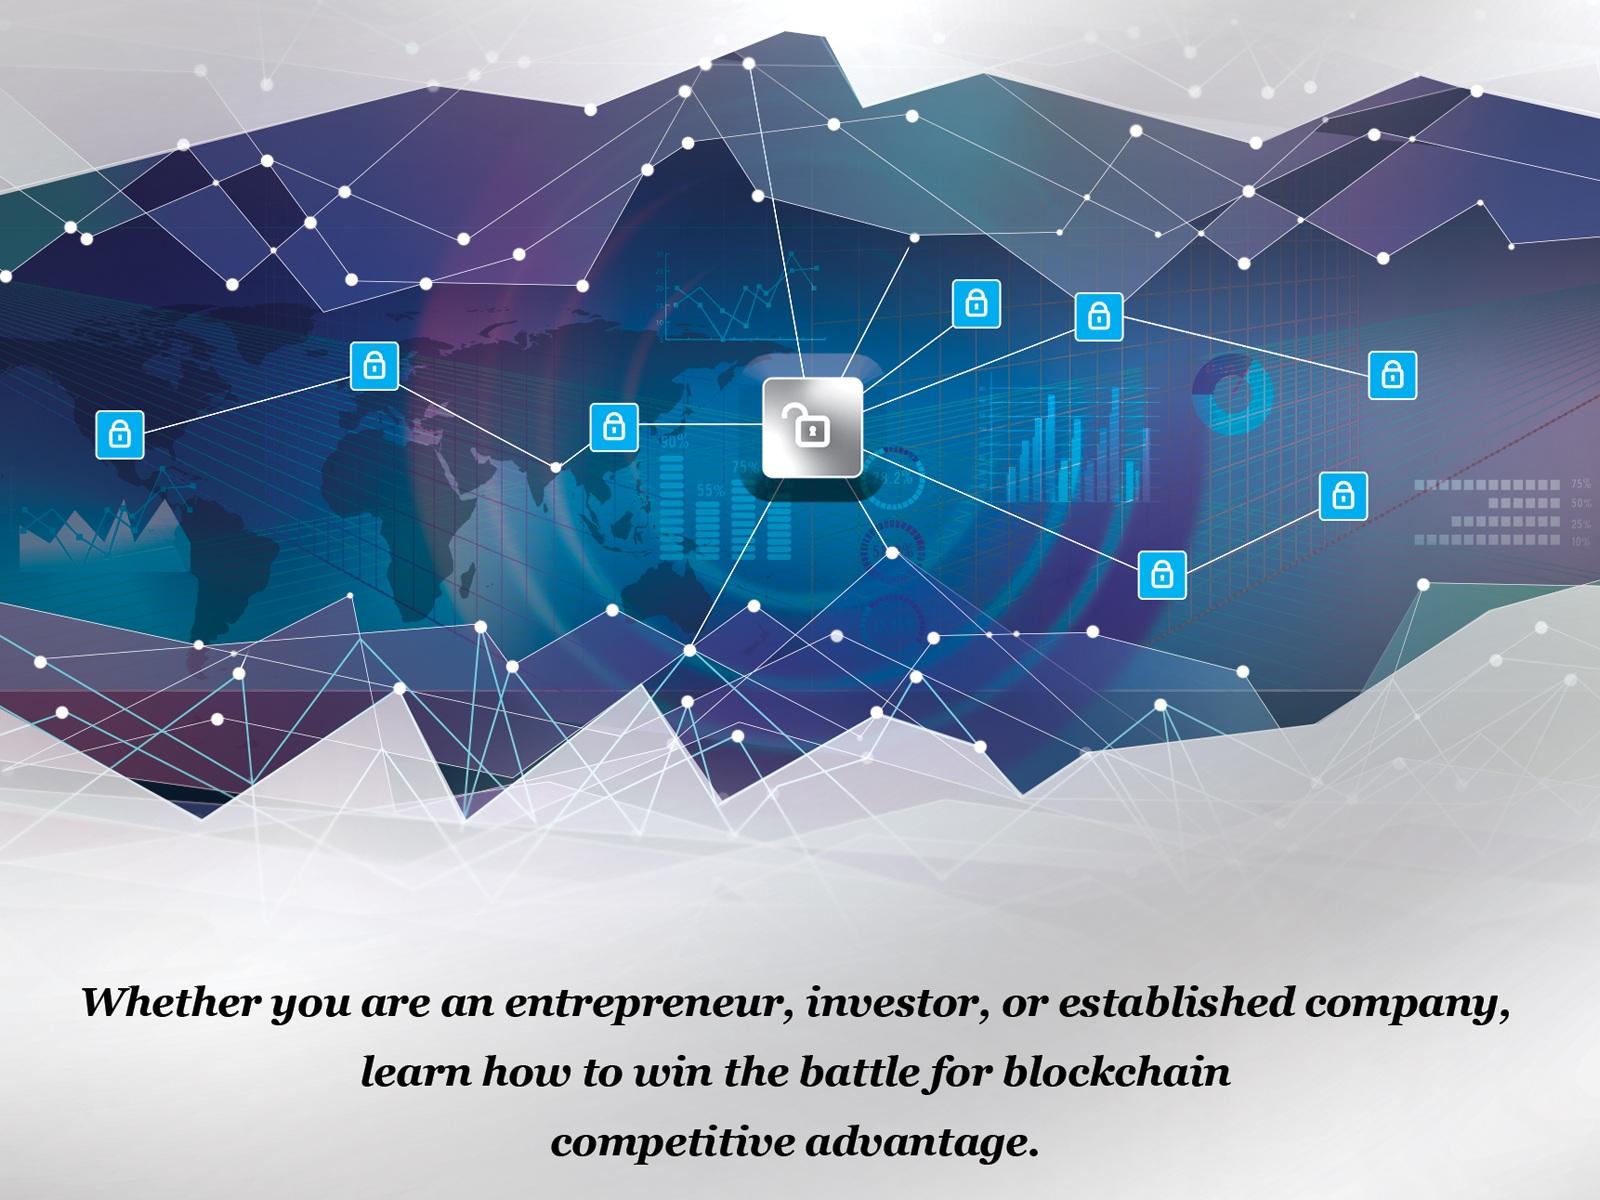 BLOCKCHAIN - BECOME A WORLD CLASS BLOCKCHAIN INVESTOR